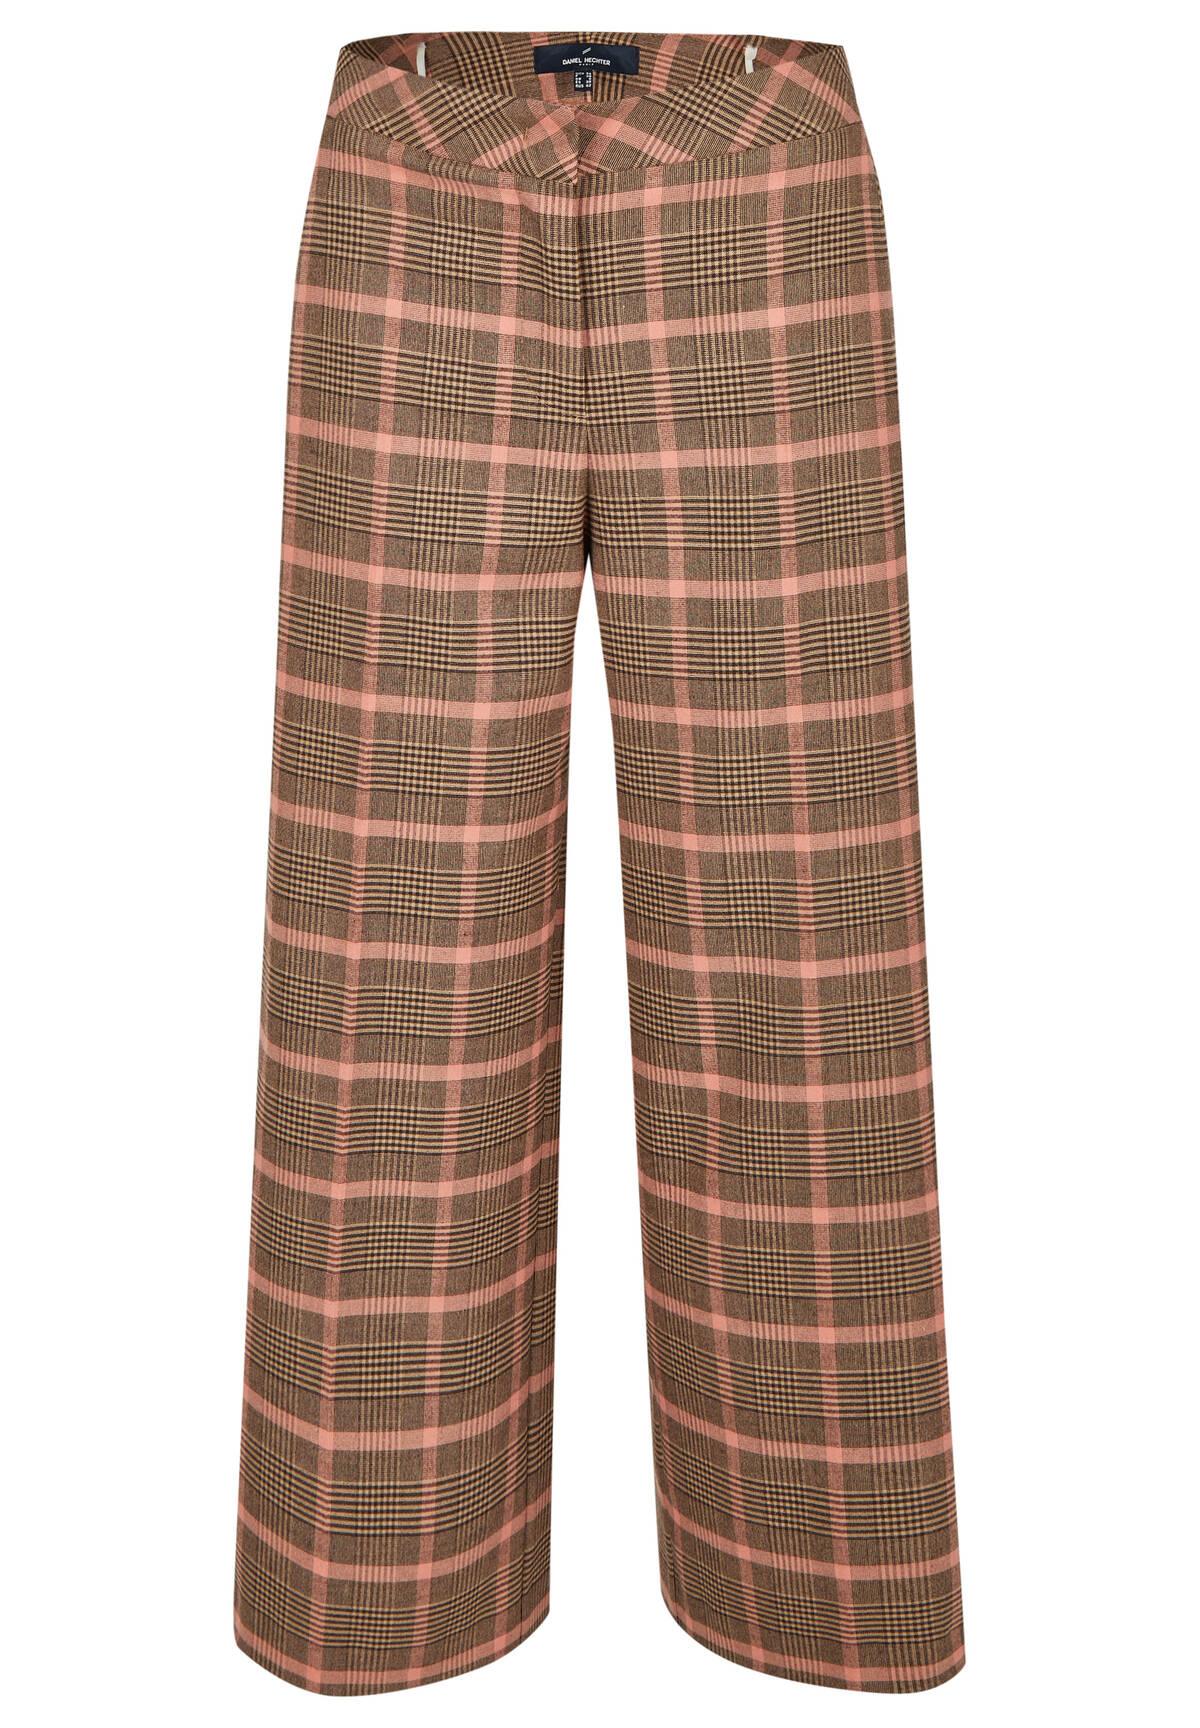 Modische Culotte / Culotte Pants